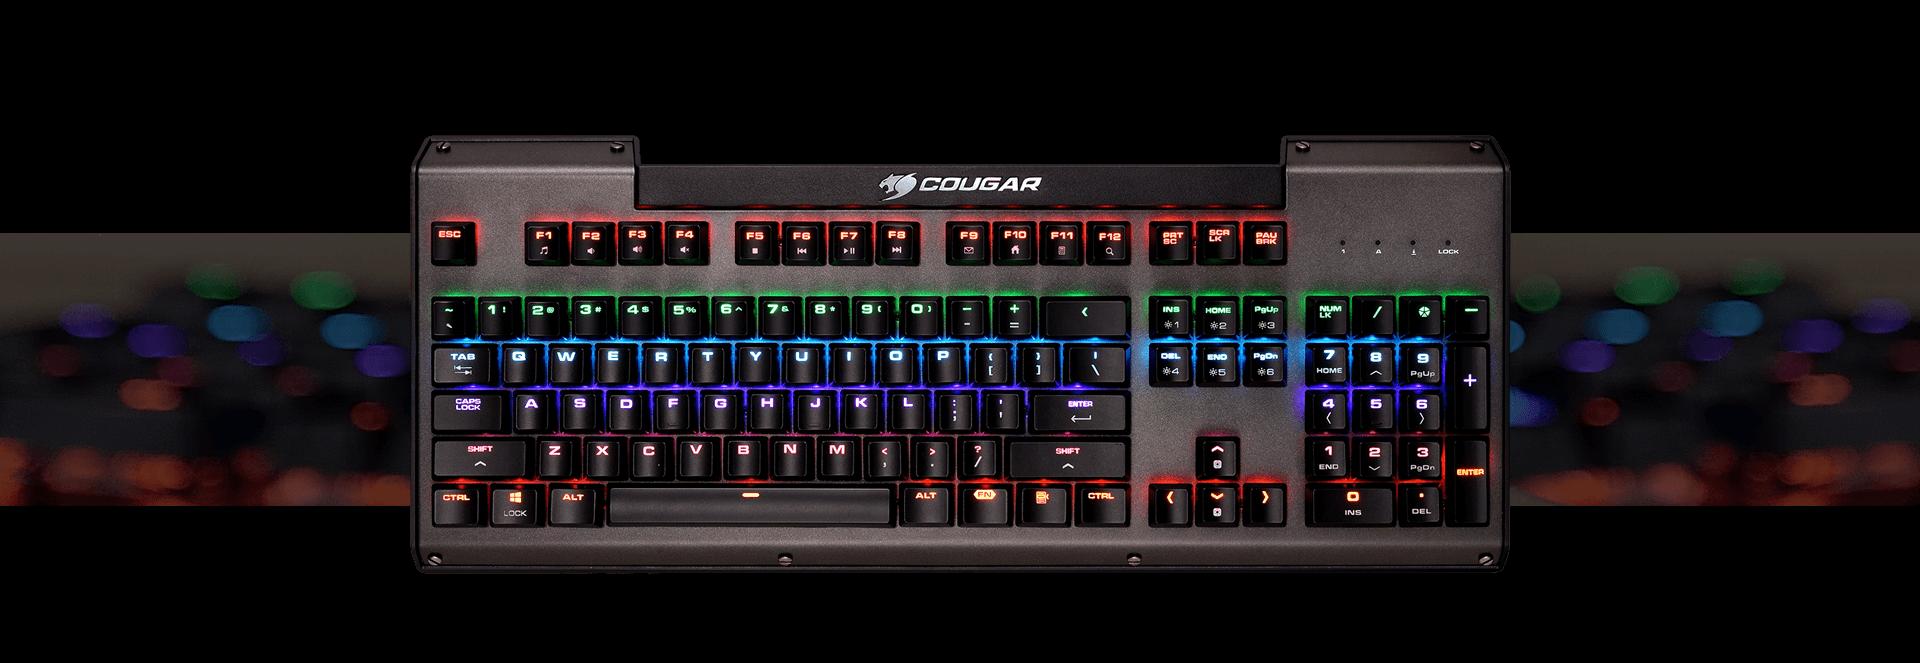 COUGAR ULTIMUS - Multicolour Mechanical Gaming Keyboard - COUGAR